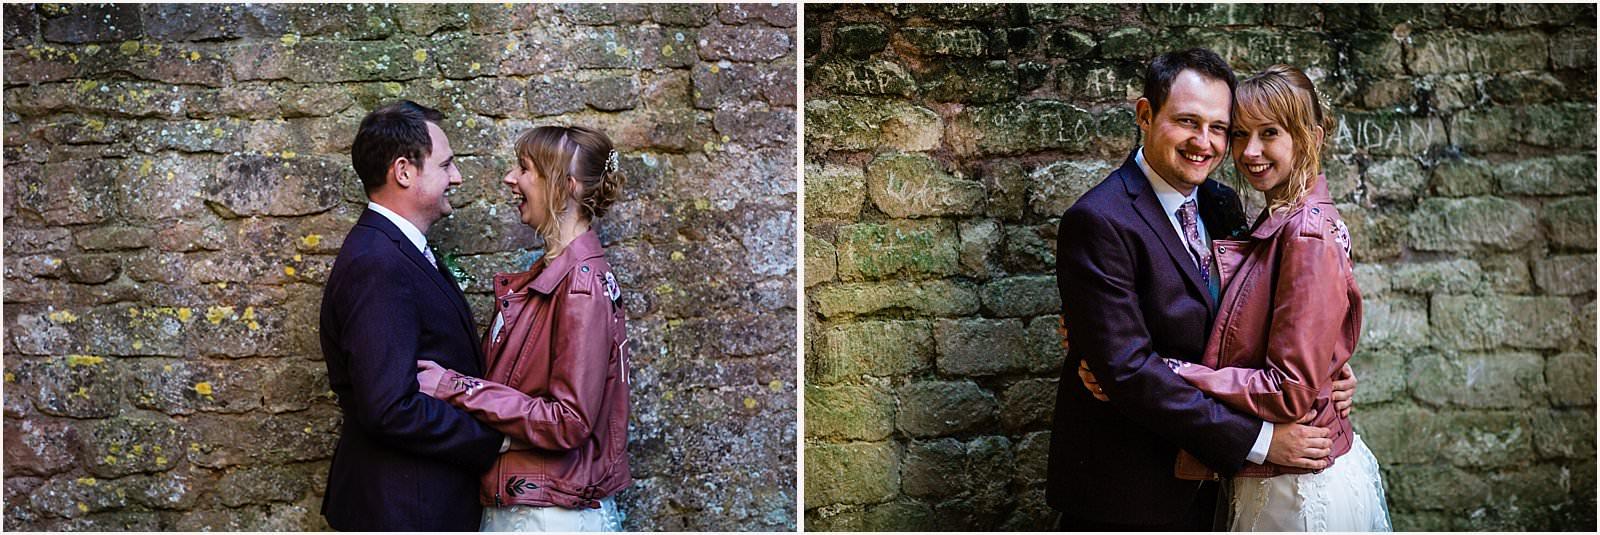 Breathtaking Nunney Castle, Somerset Wedding Photographer  - Sarah & Daniel 66